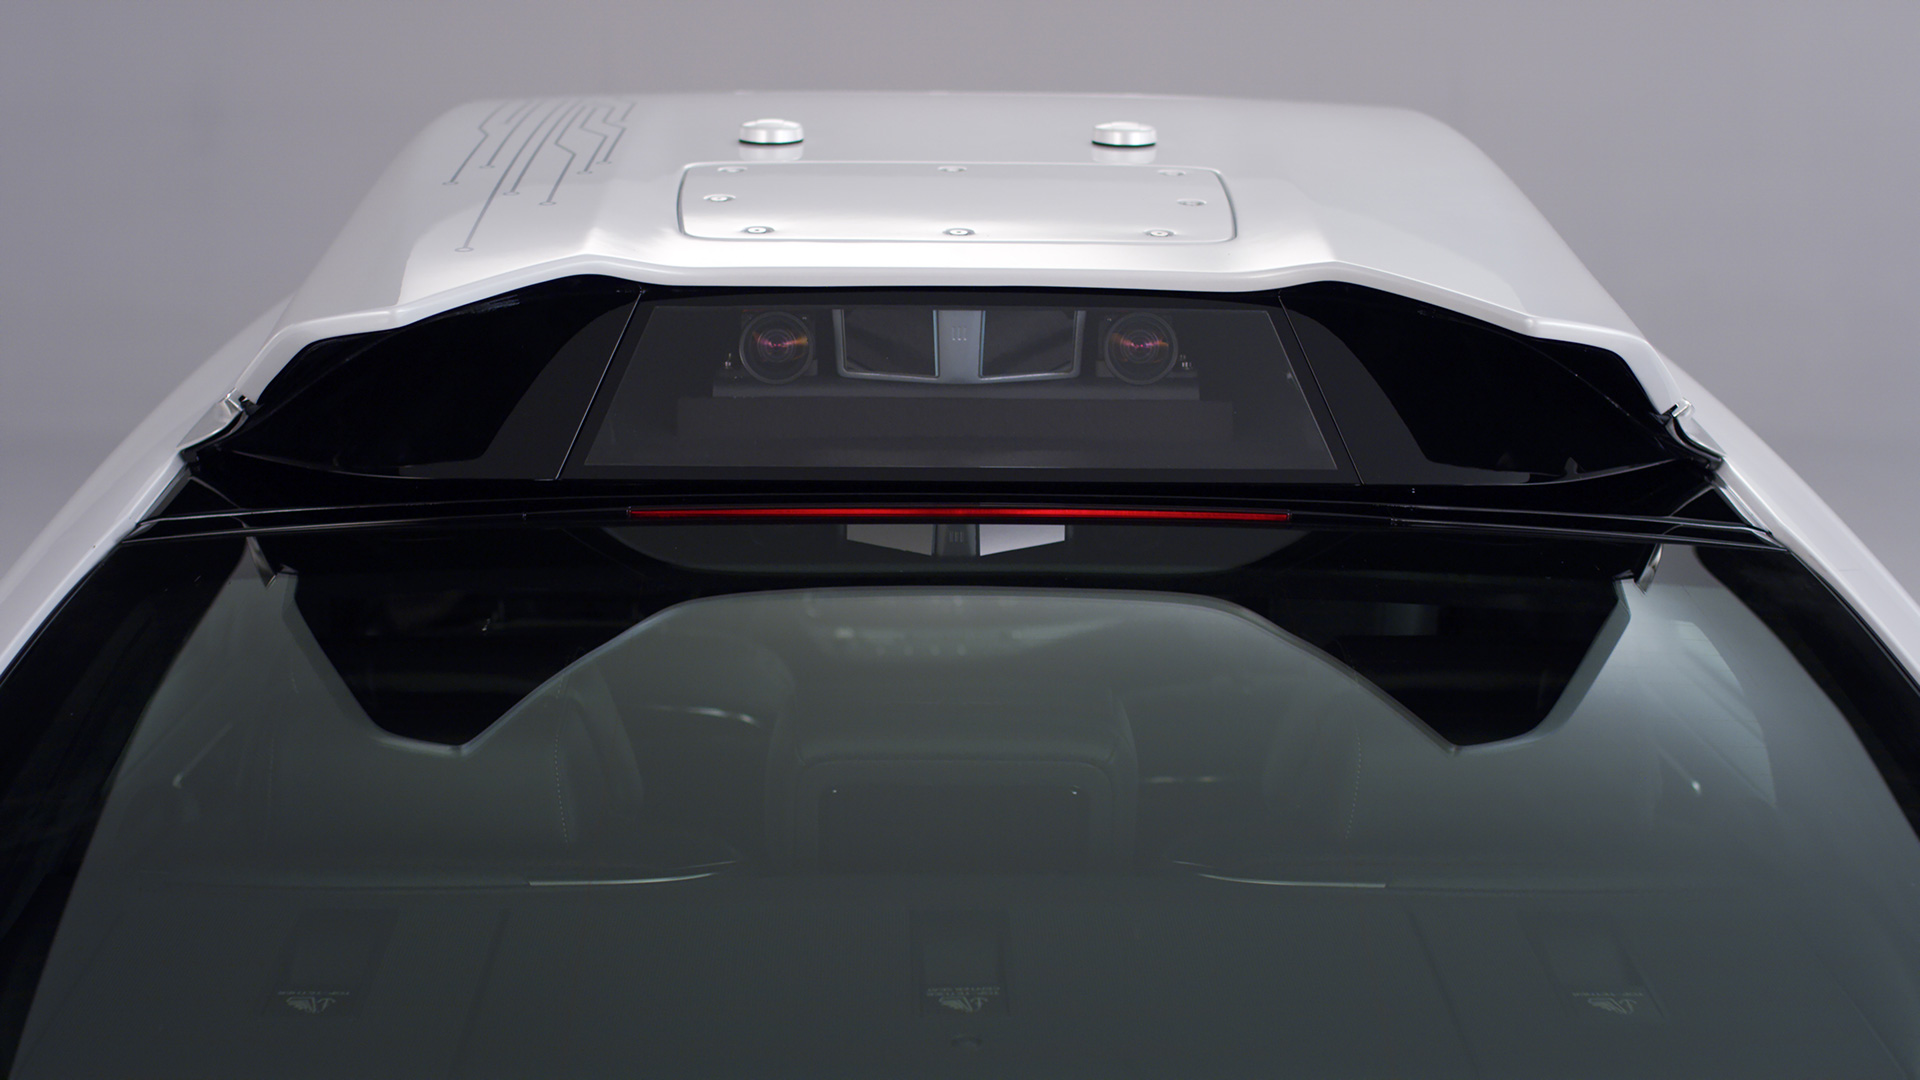 「【CES 2019】新型レクサスLSをベースとした自動運転実験車「TRI-P4」を披露」の7枚目の画像